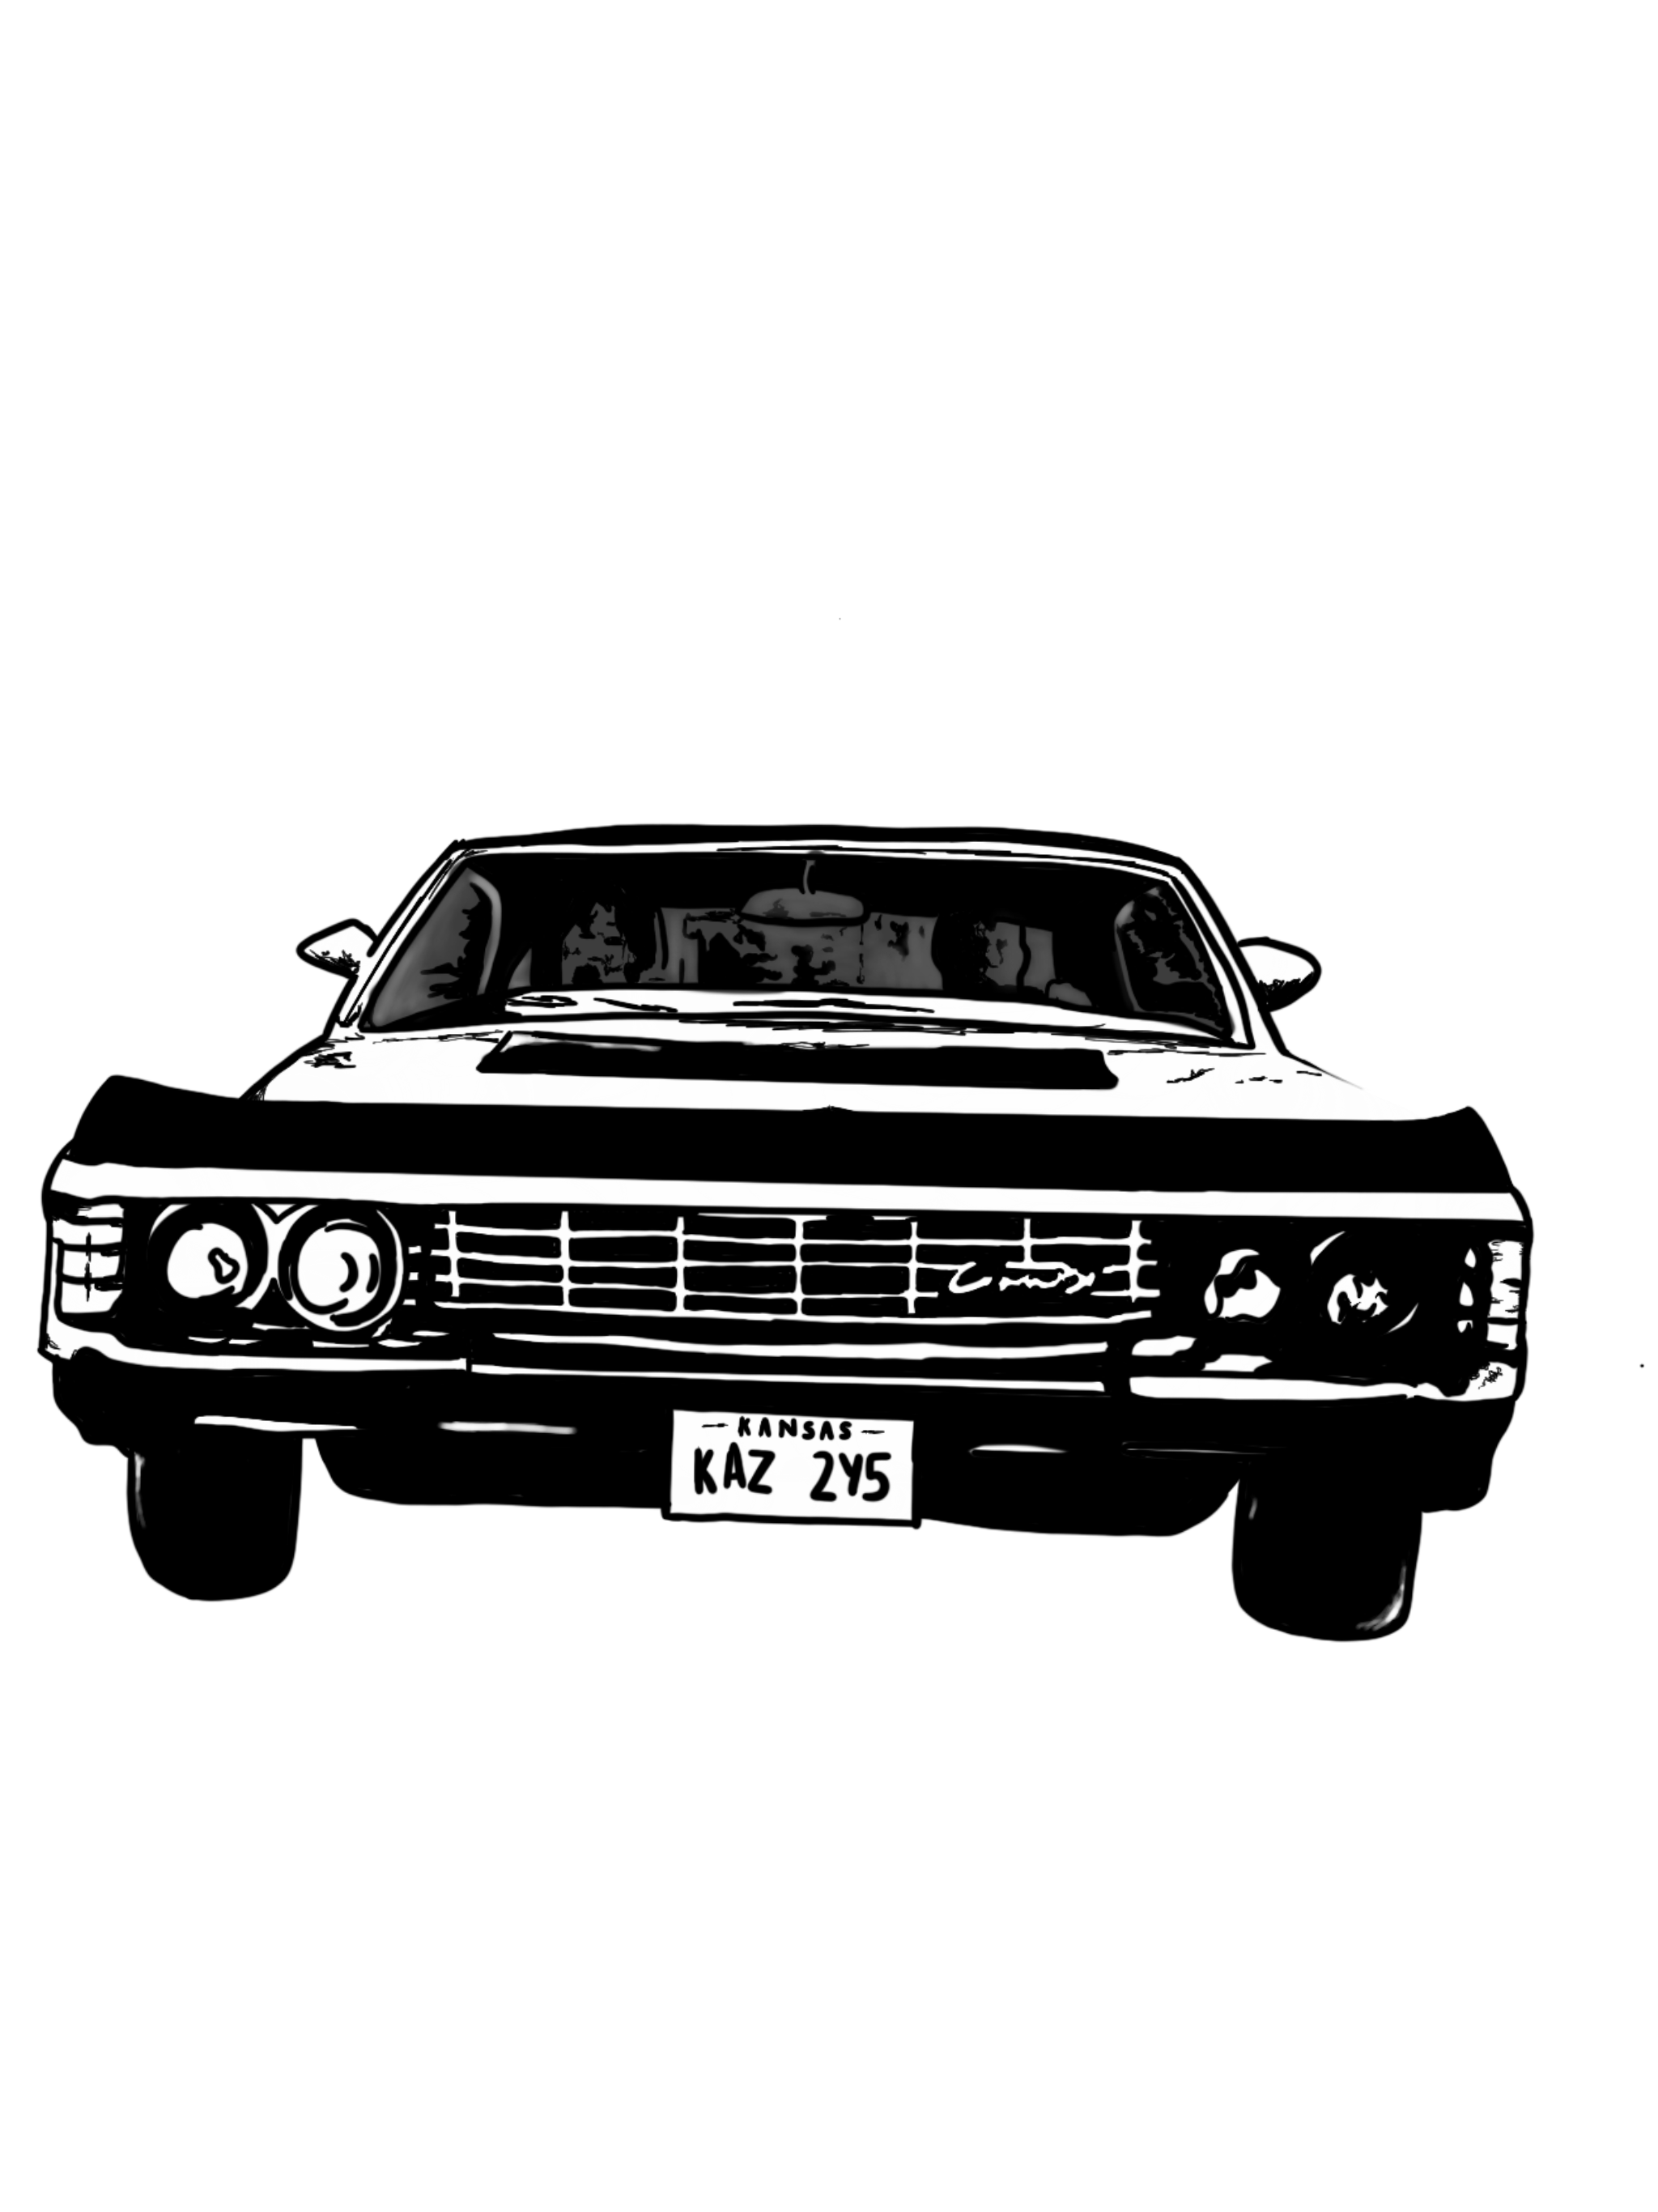 1967 Chevy Impala 1967 Chevy Impala Chevy Impala Impala